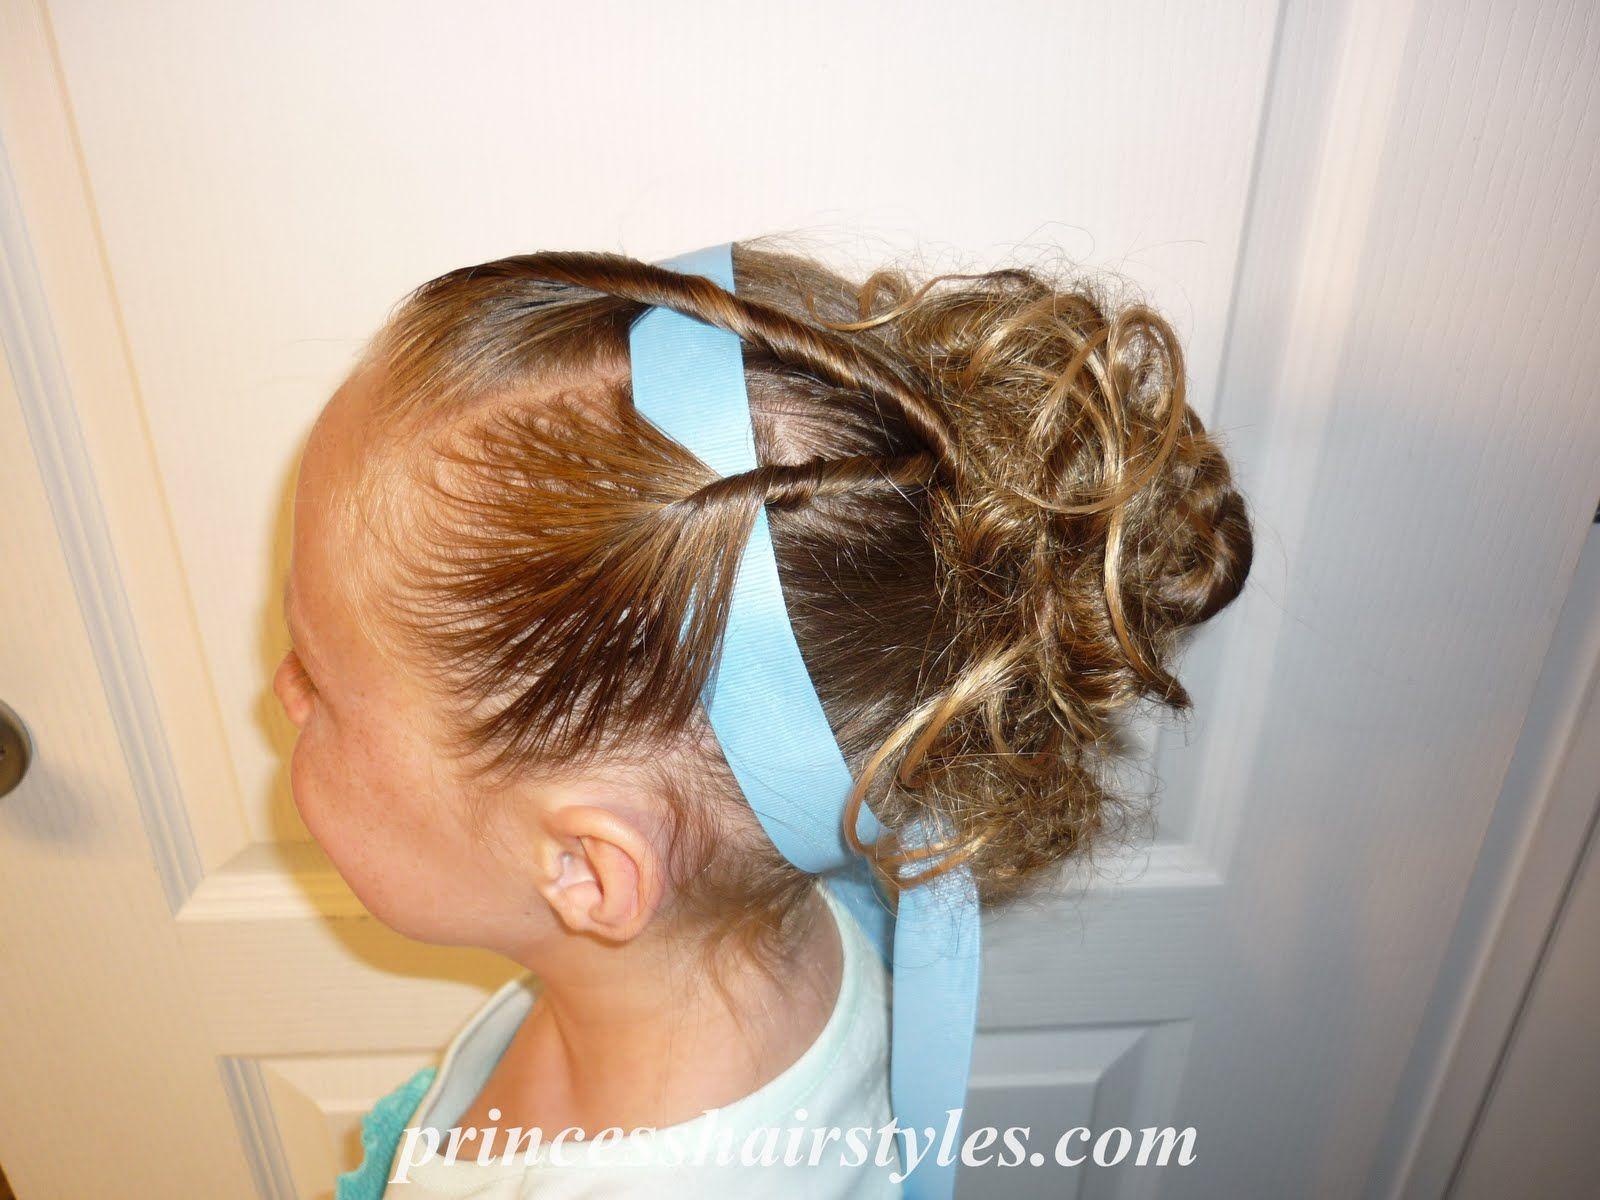 dance recital hair styles   hairstyles for girls - hair styles